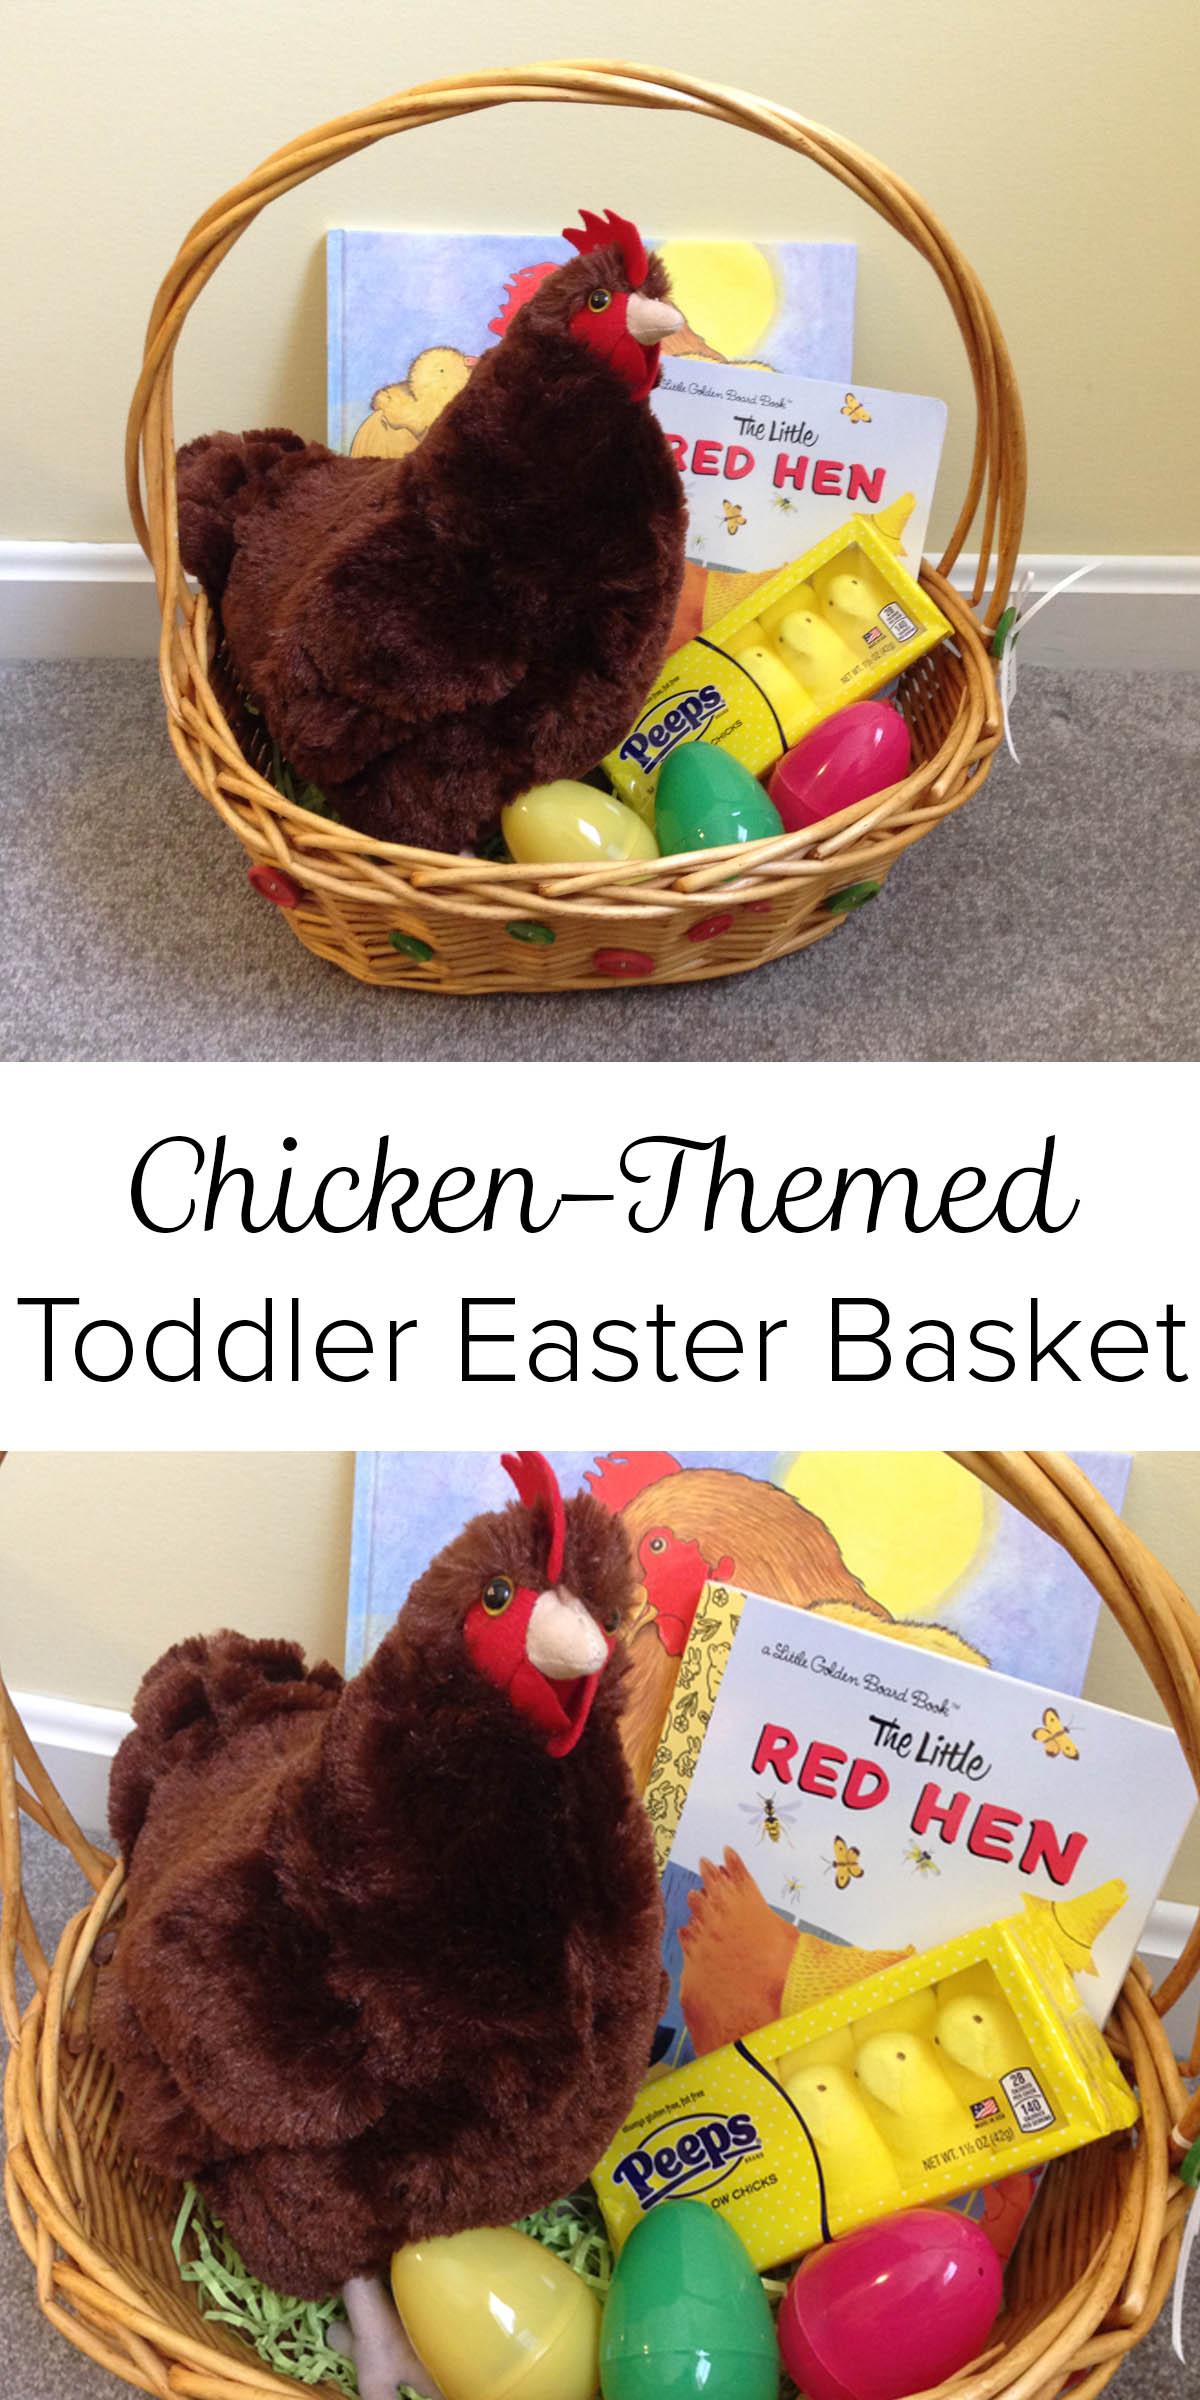 Chicken-Themed Toddler Easter Basket